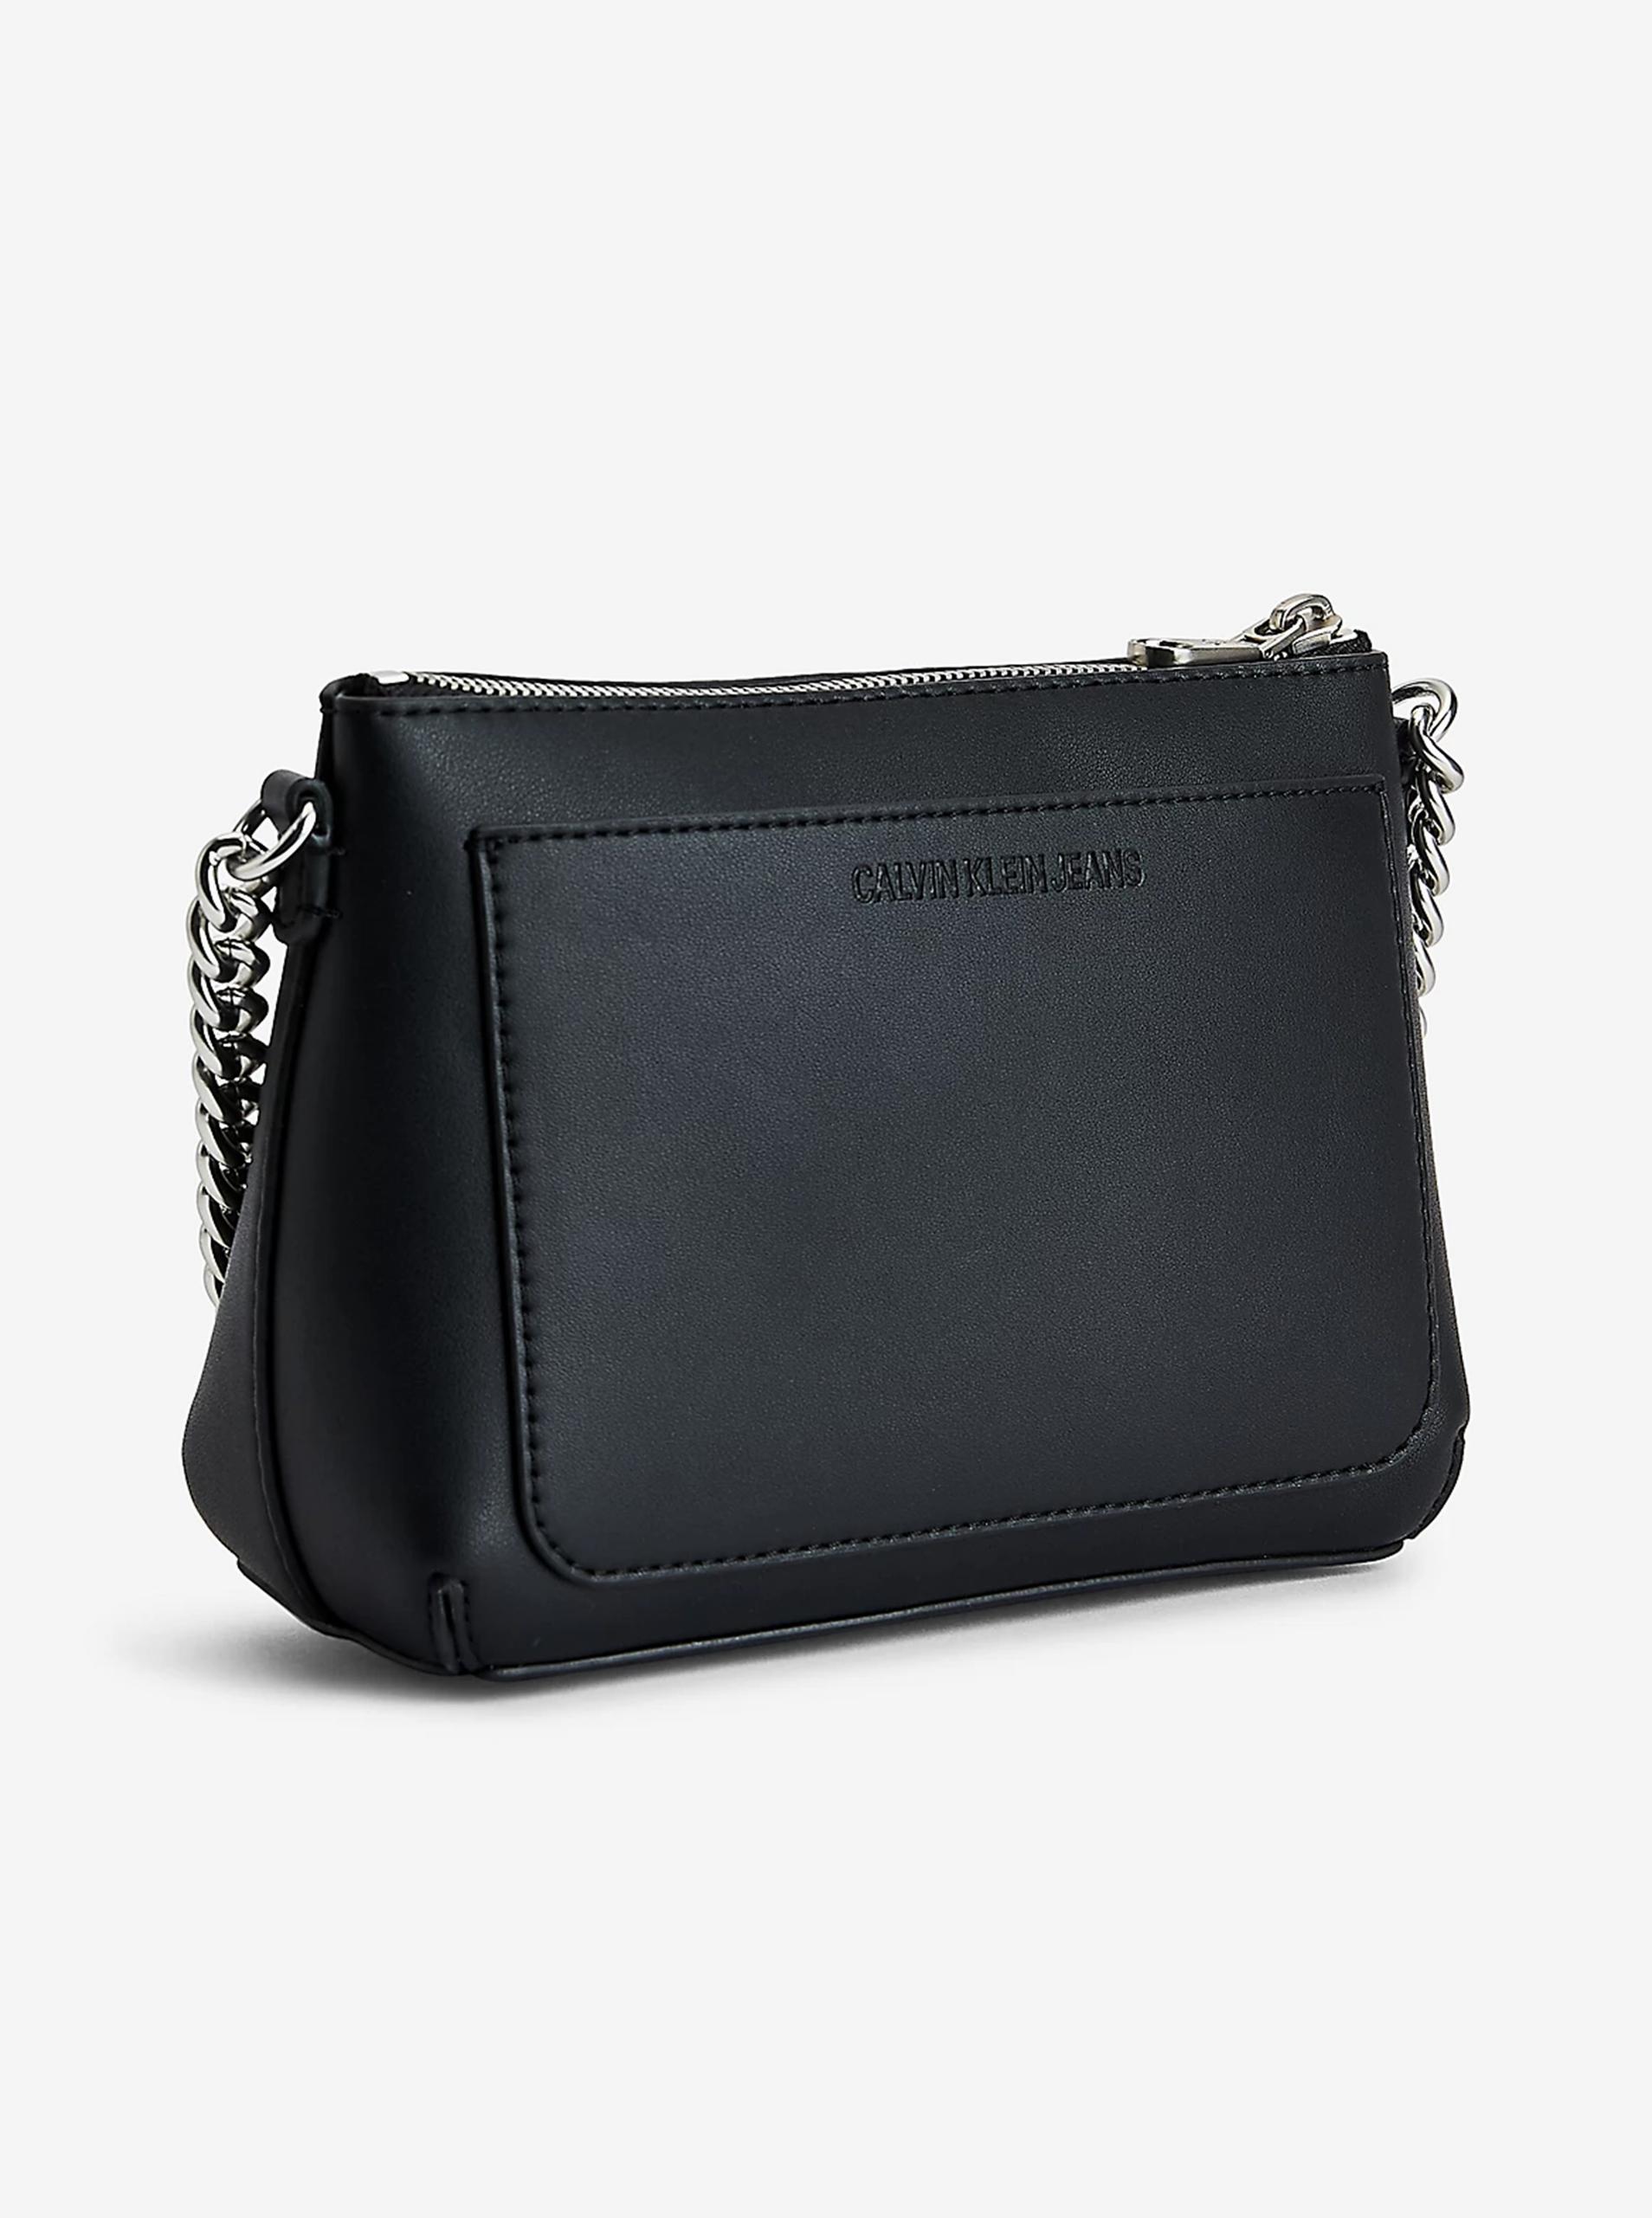 Calvin Klein black crossbody handbag